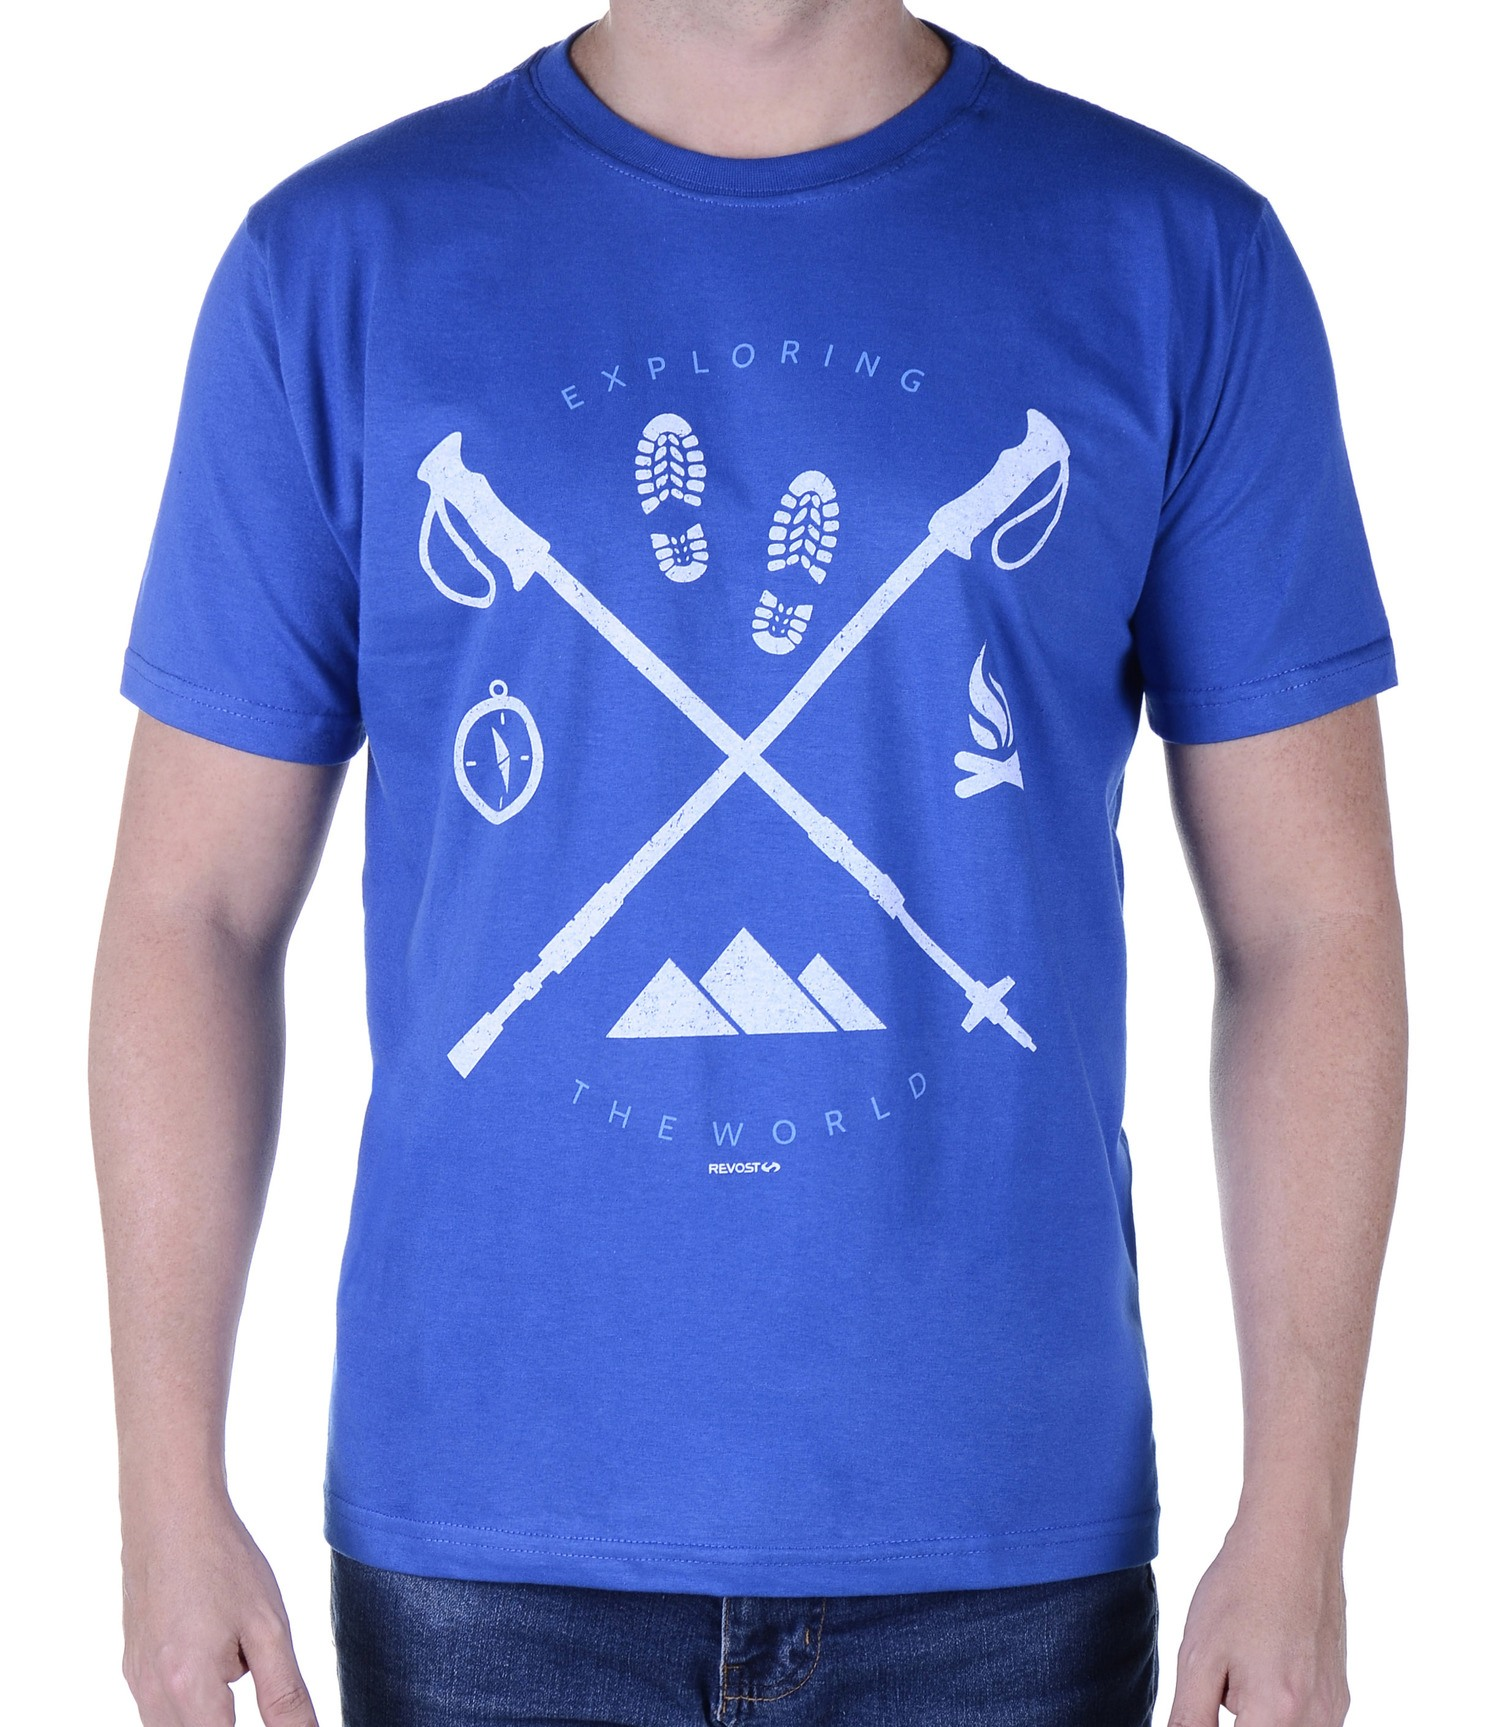 Camiseta Masculina Revost Exploring - Azul